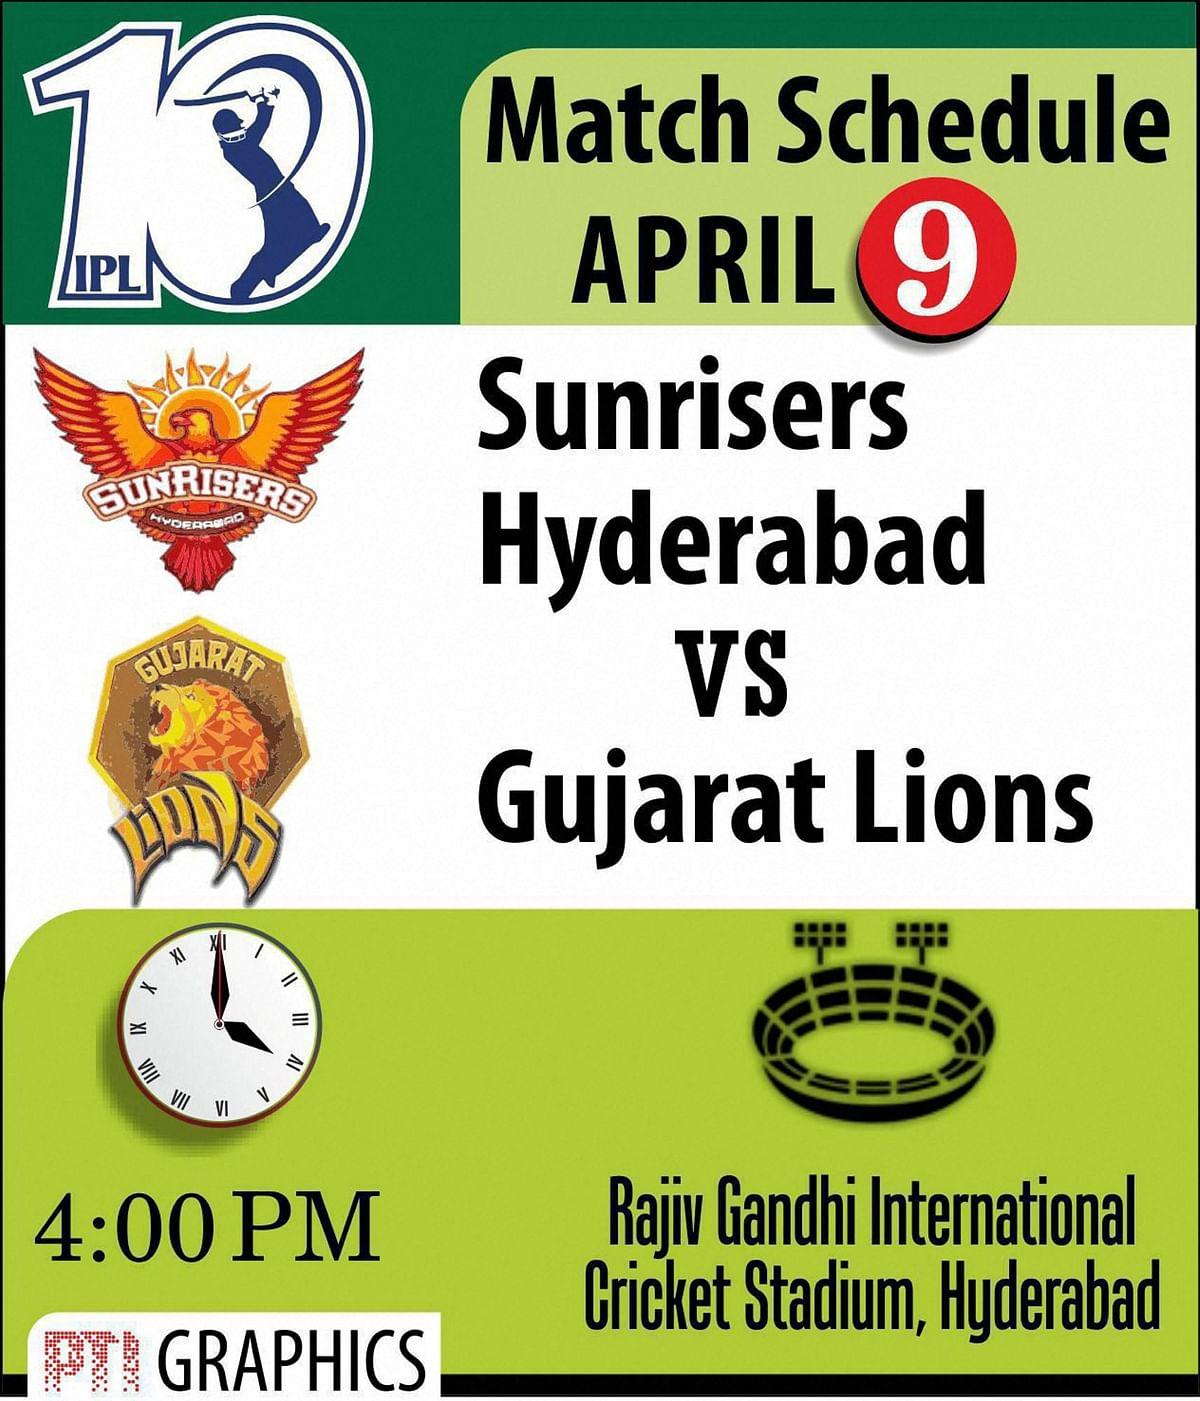 Sunday Pvw, Game 1: Sunrisers Hyderabad vs Gujarat Lions